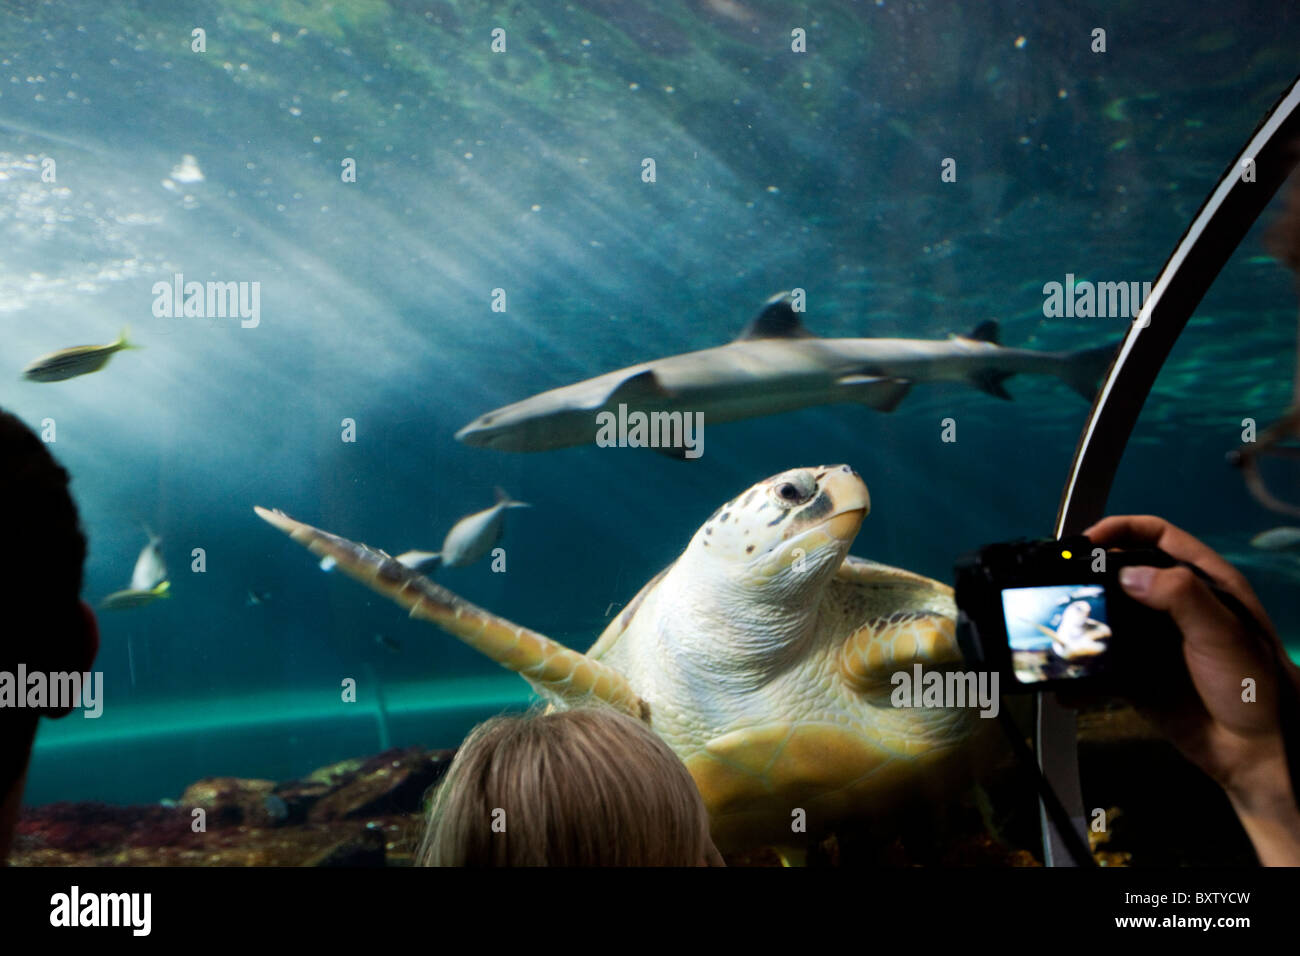 Australia, New South Wales, Sydney, Tourist photographs Loggerhead Turtle (Caretta caretta) swimming inside Sydney - Stock Image